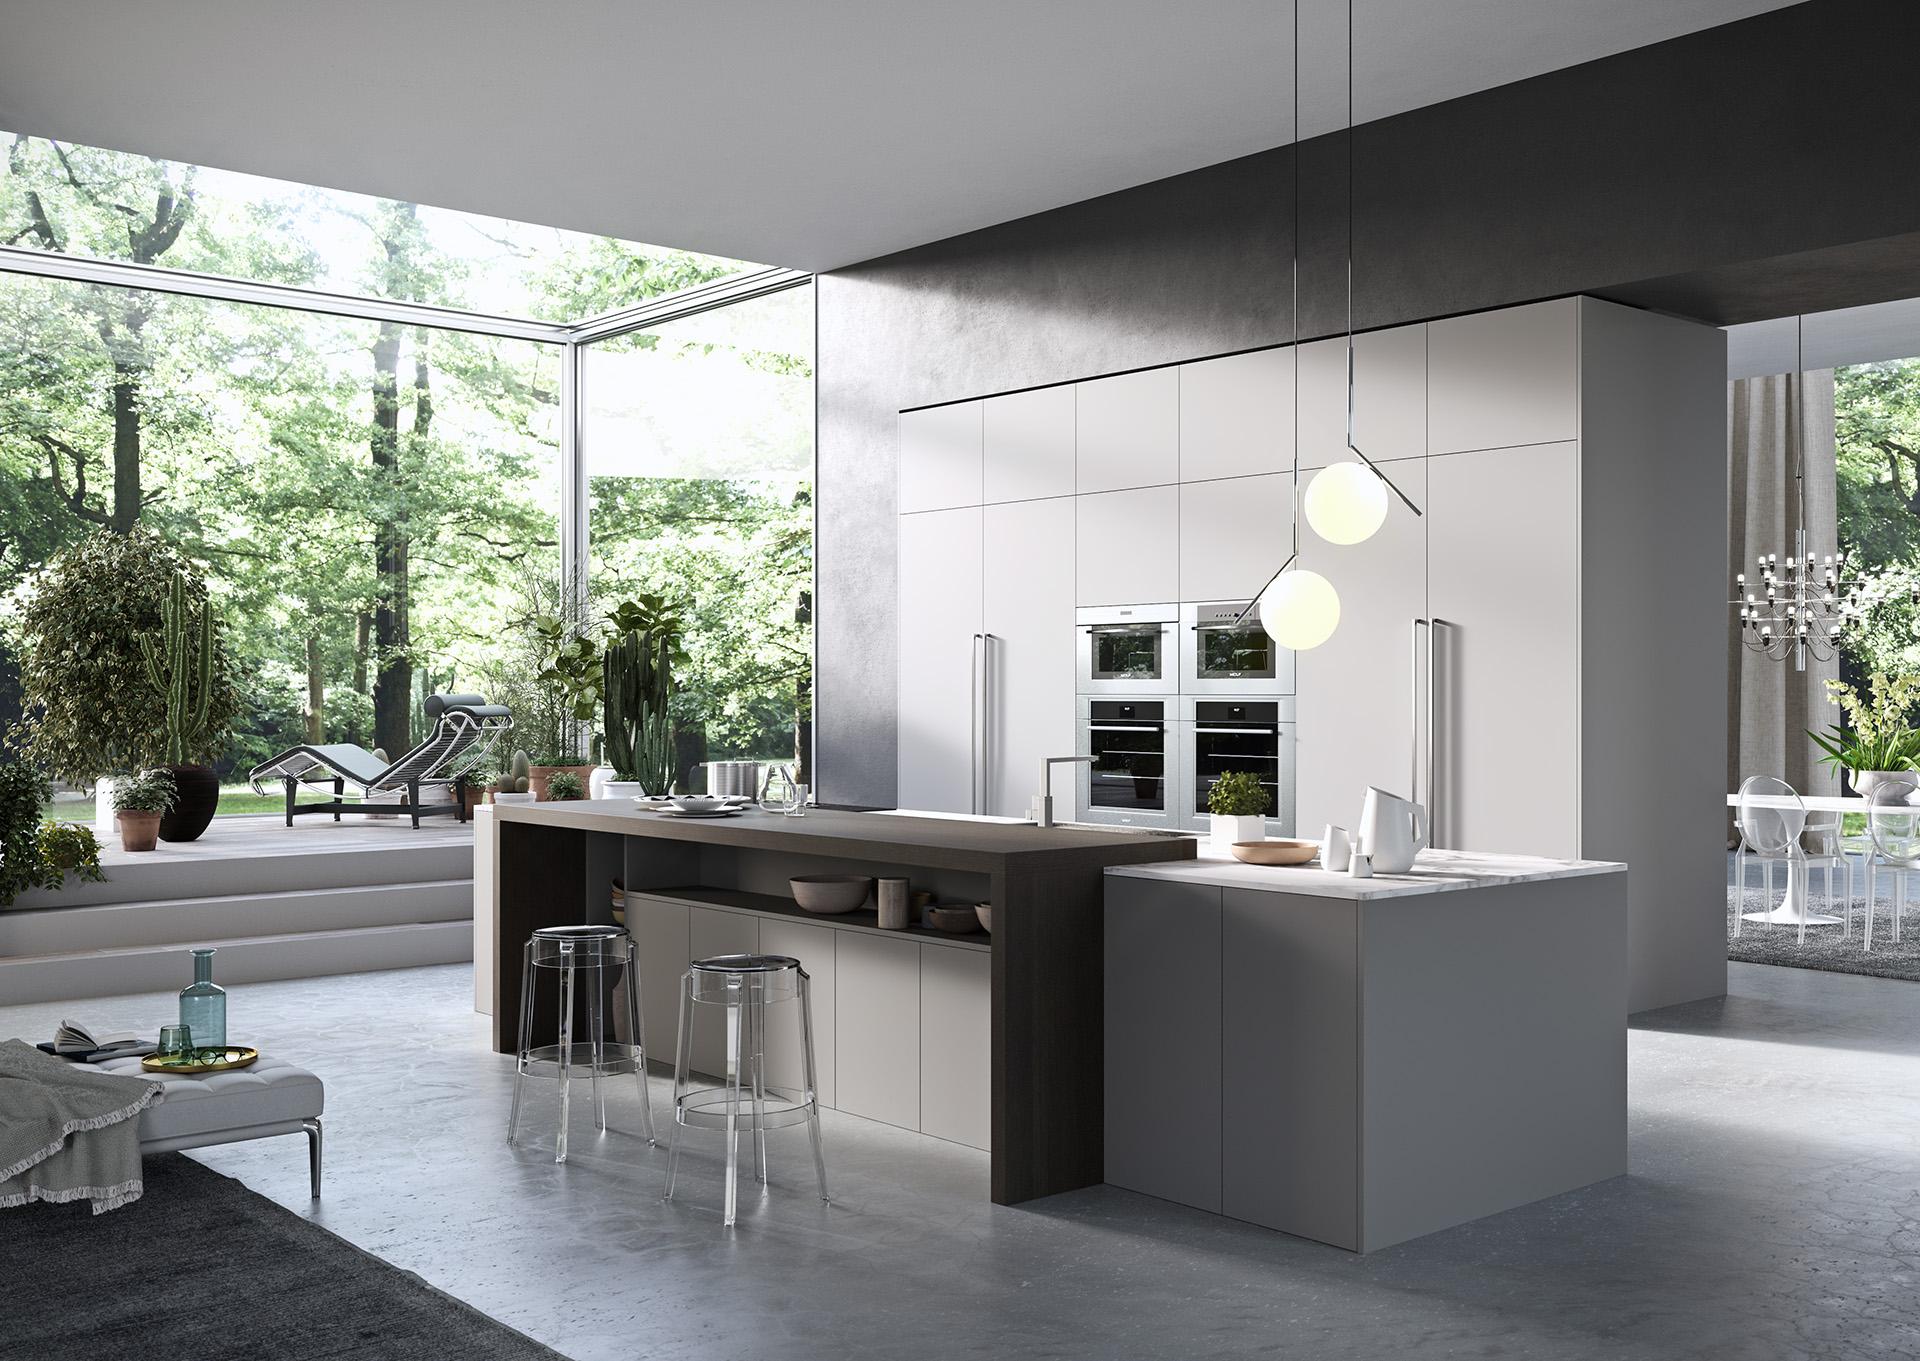 Mia Cucina Kitchens